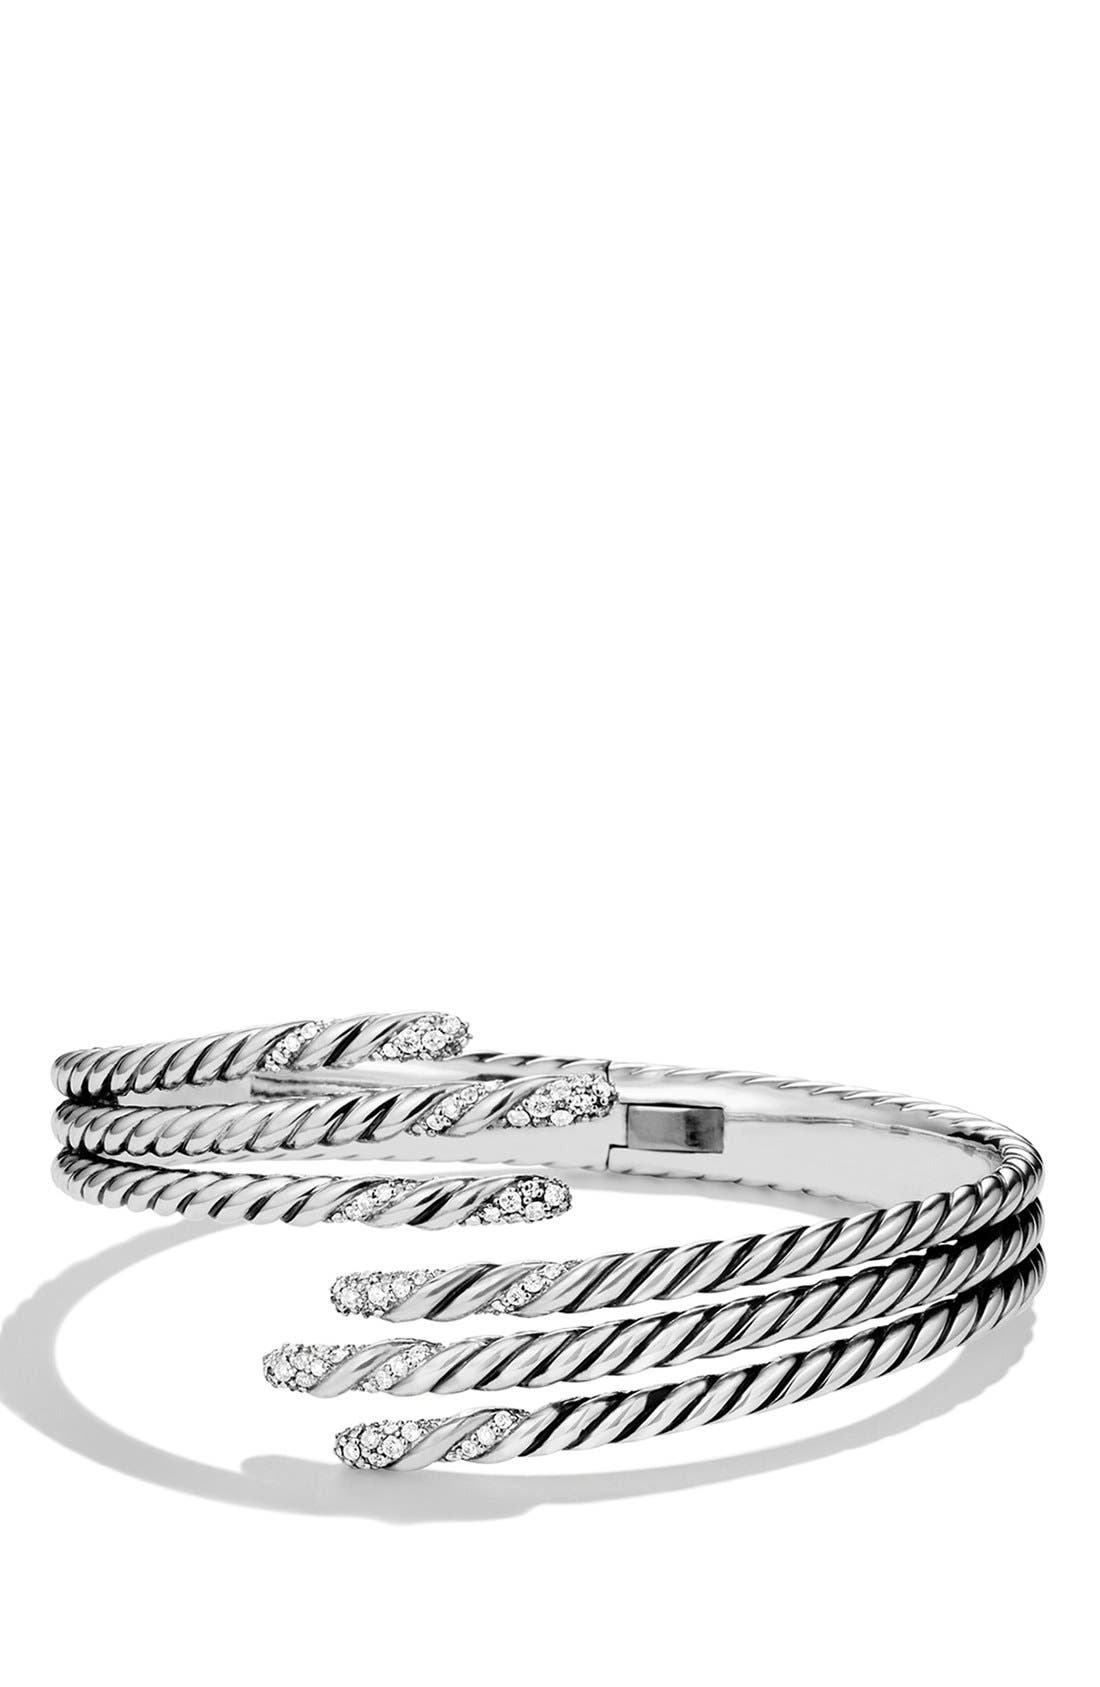 DAVID YURMAN Willow Open Three-Row Bracelet with Diamonds